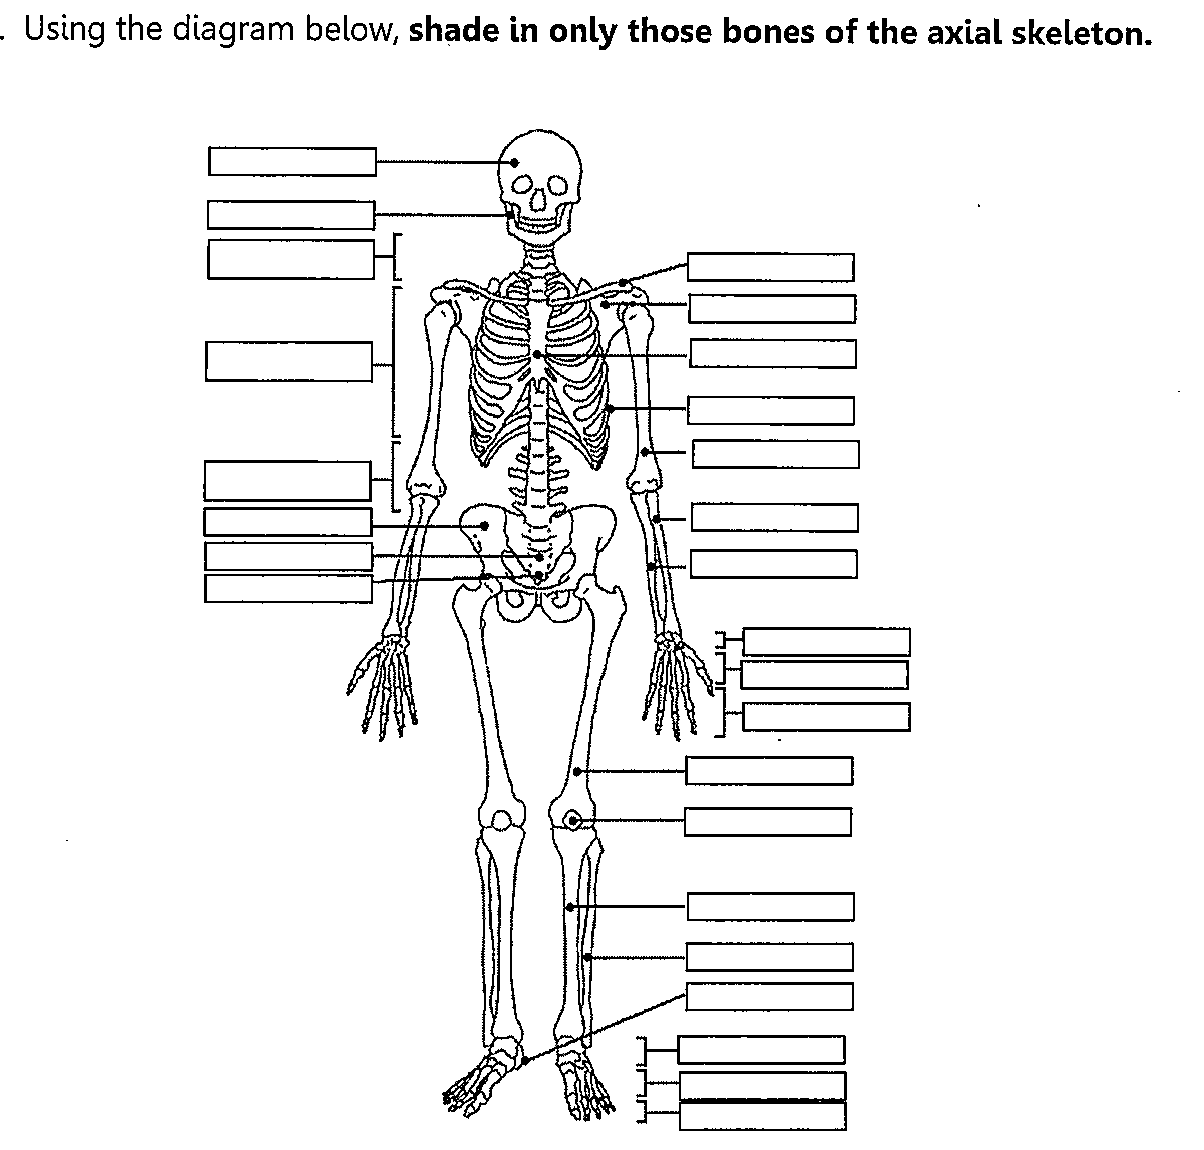 Axial Skeleton Worksheet Fill In The Blank